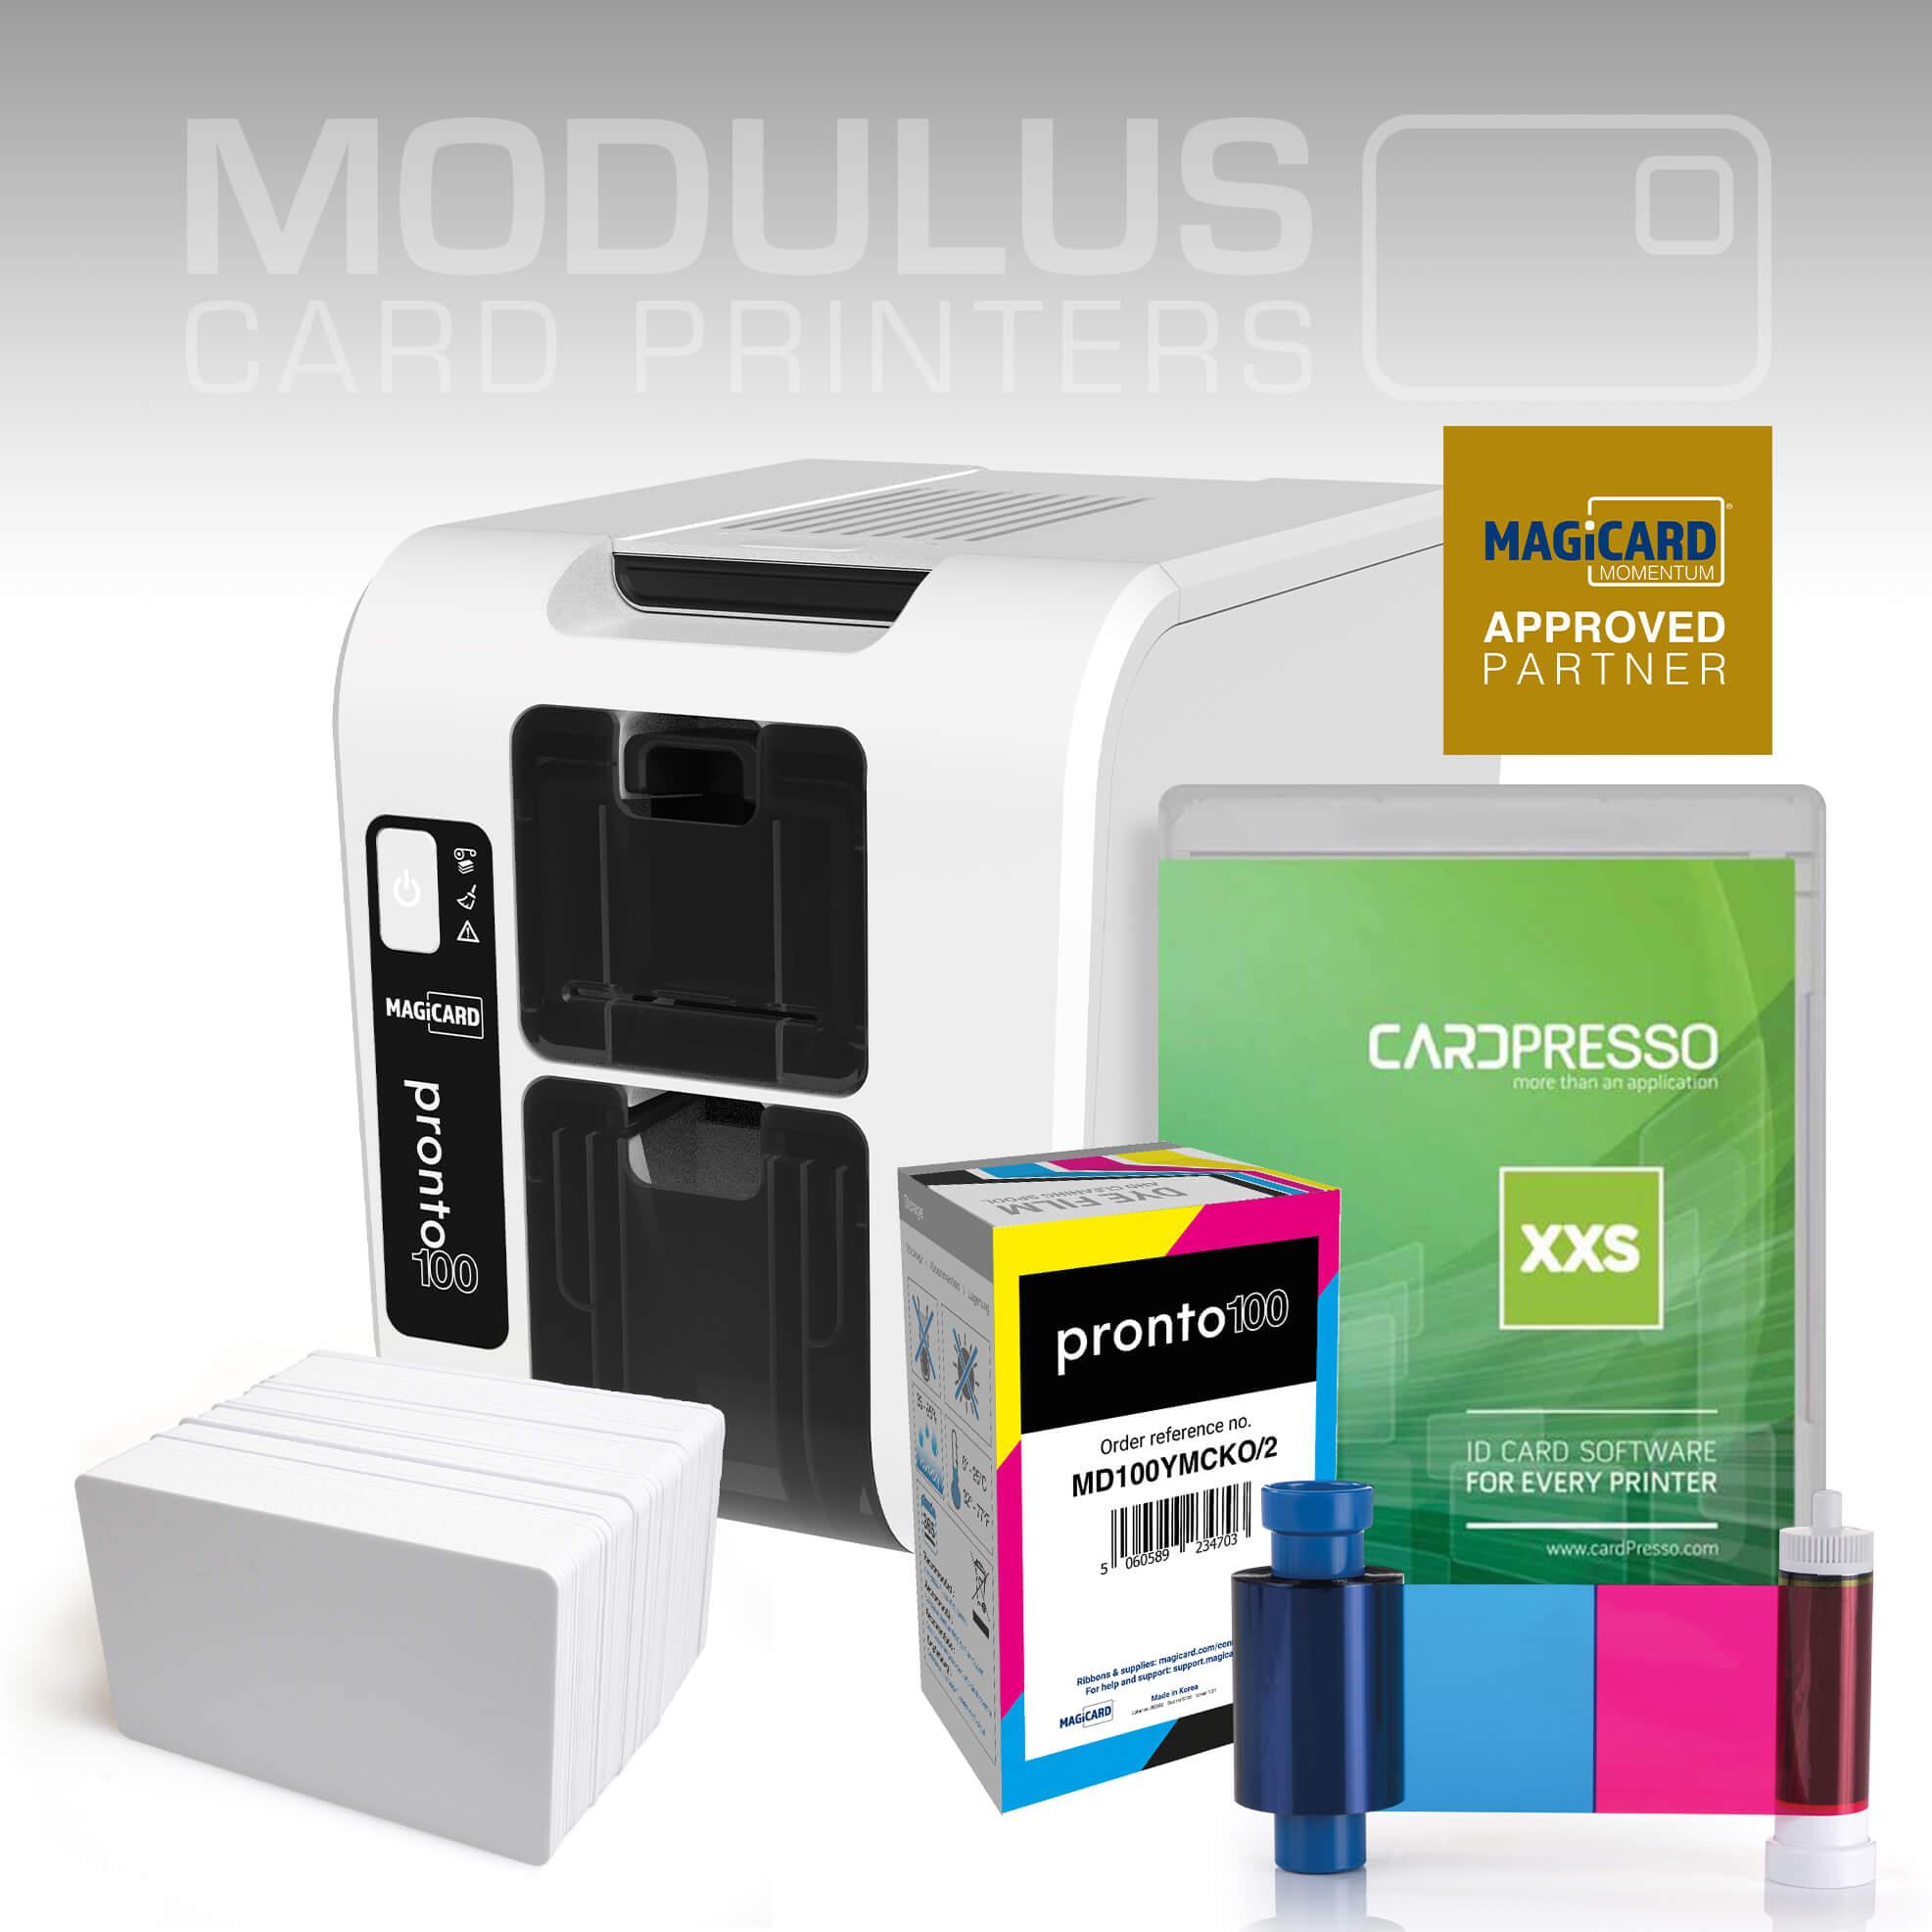 Magicard Pronto100 ID Card Printer Package